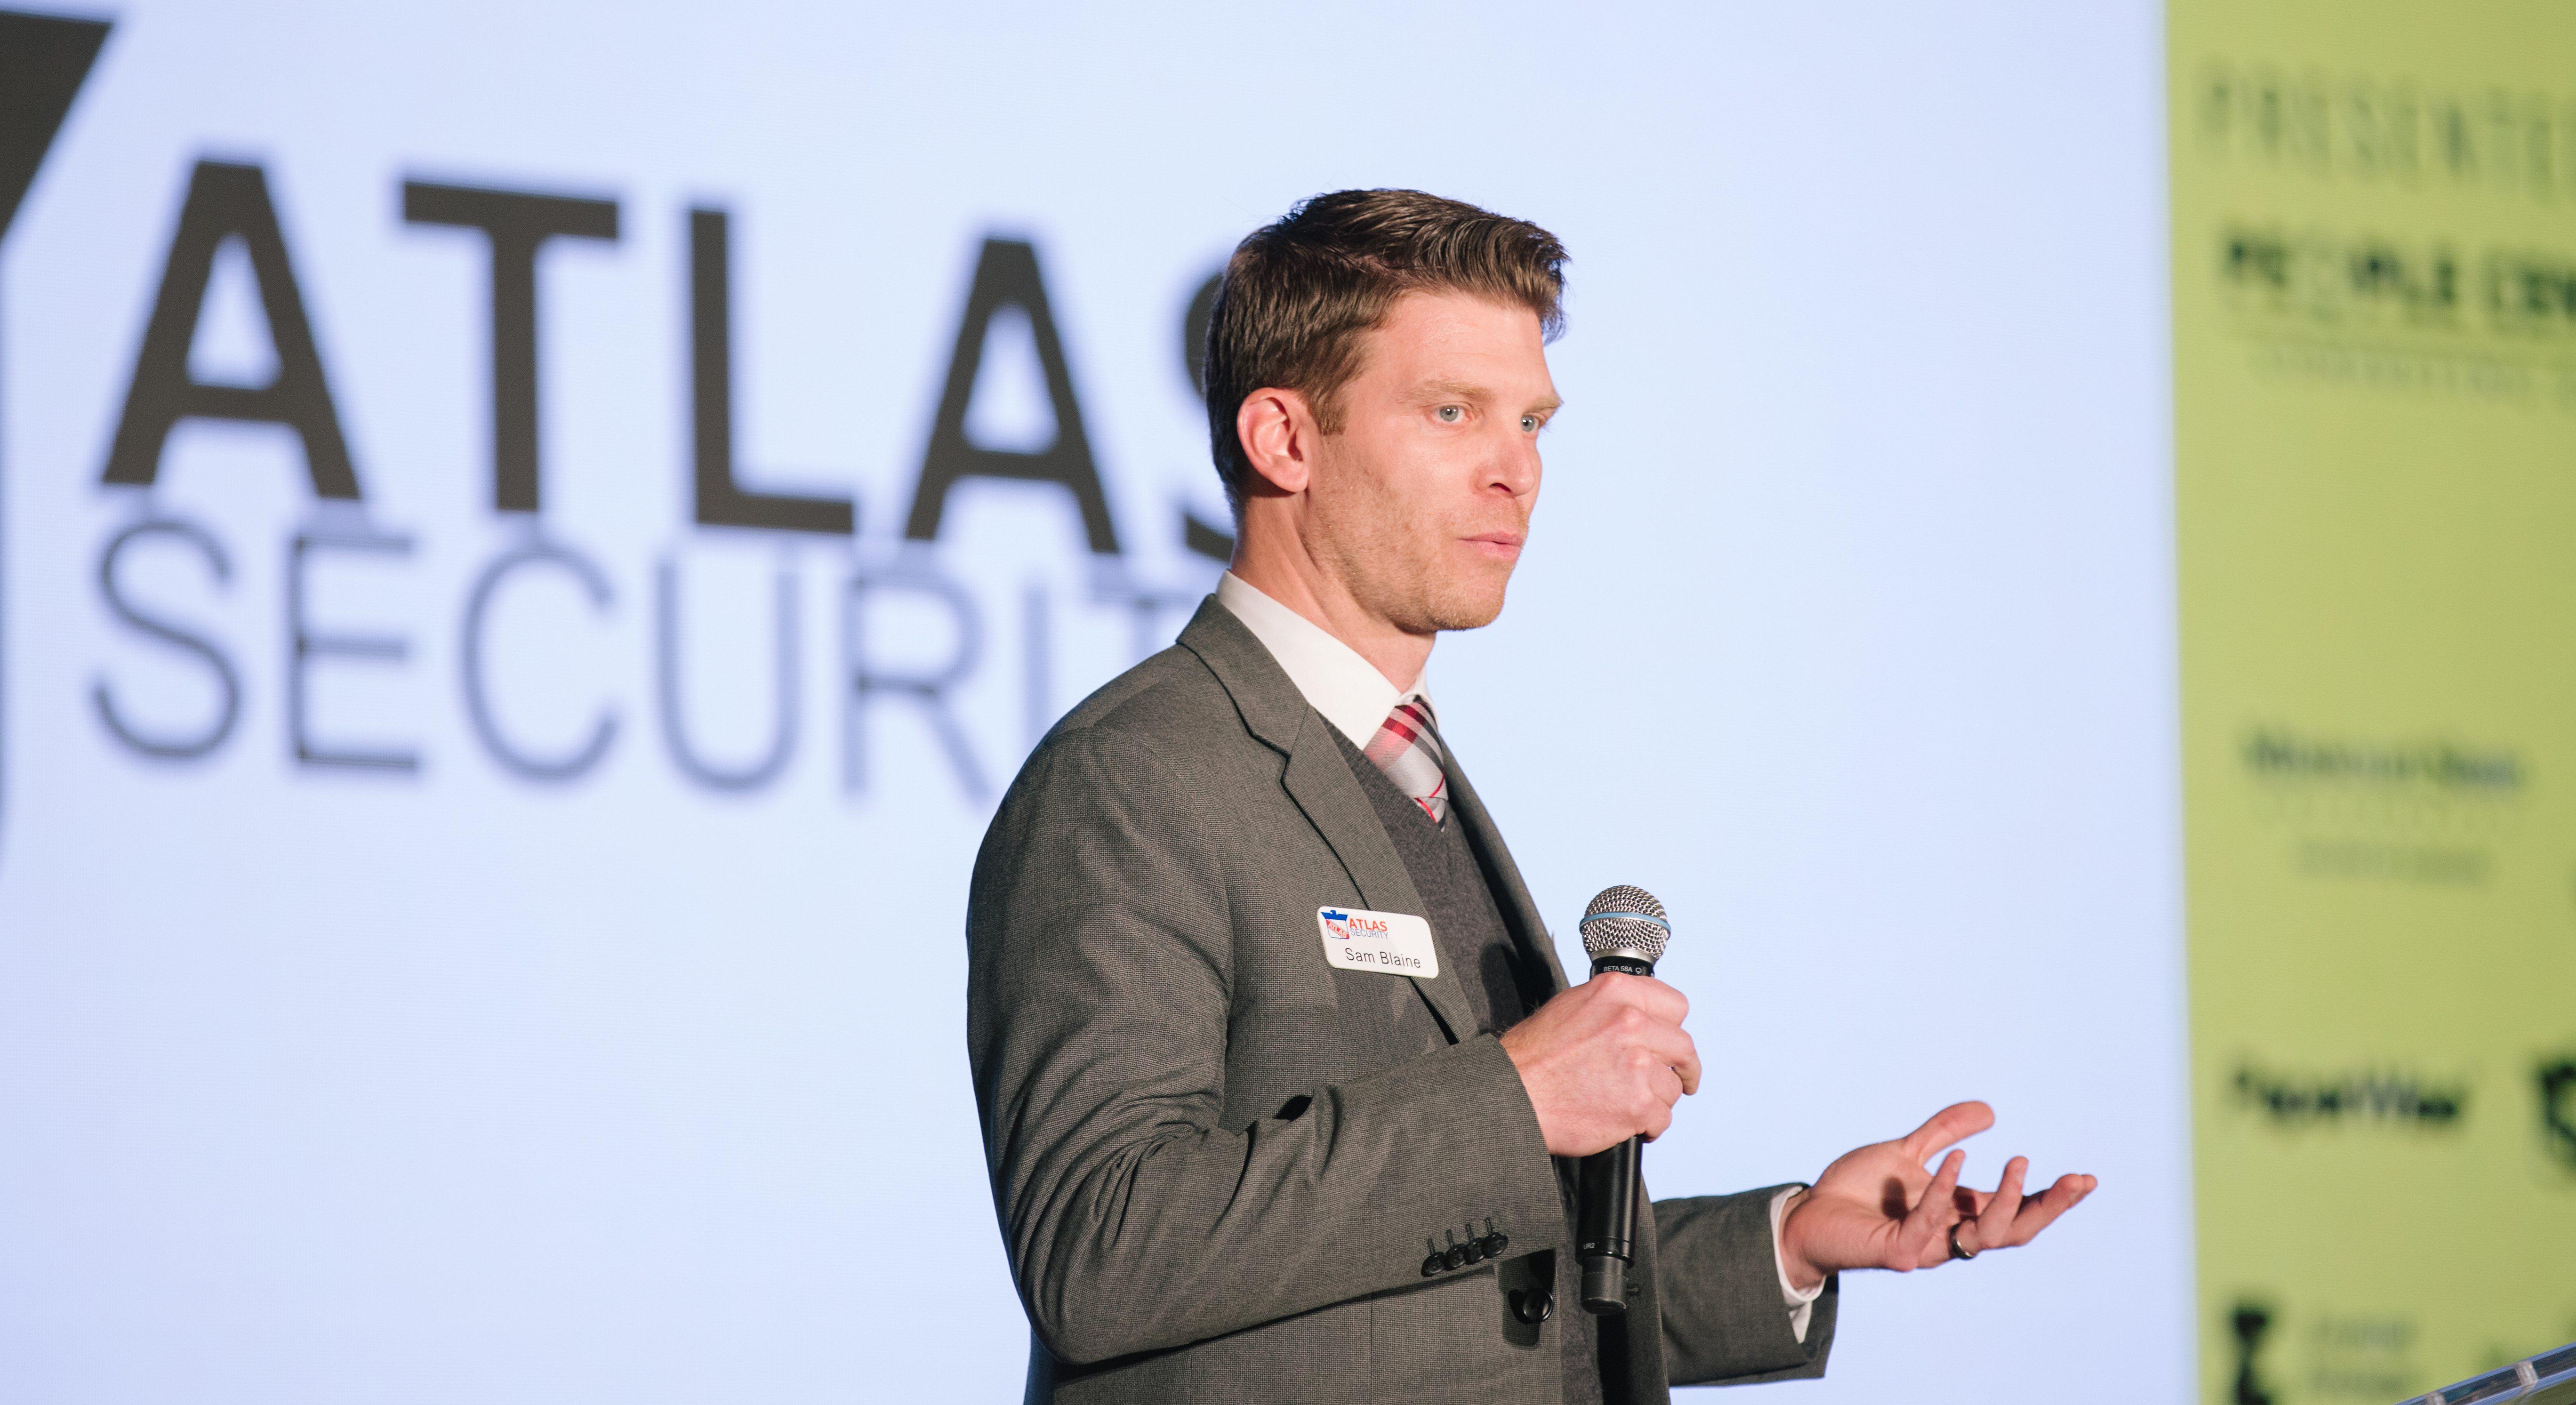 Atlas Security's Sam Blaine